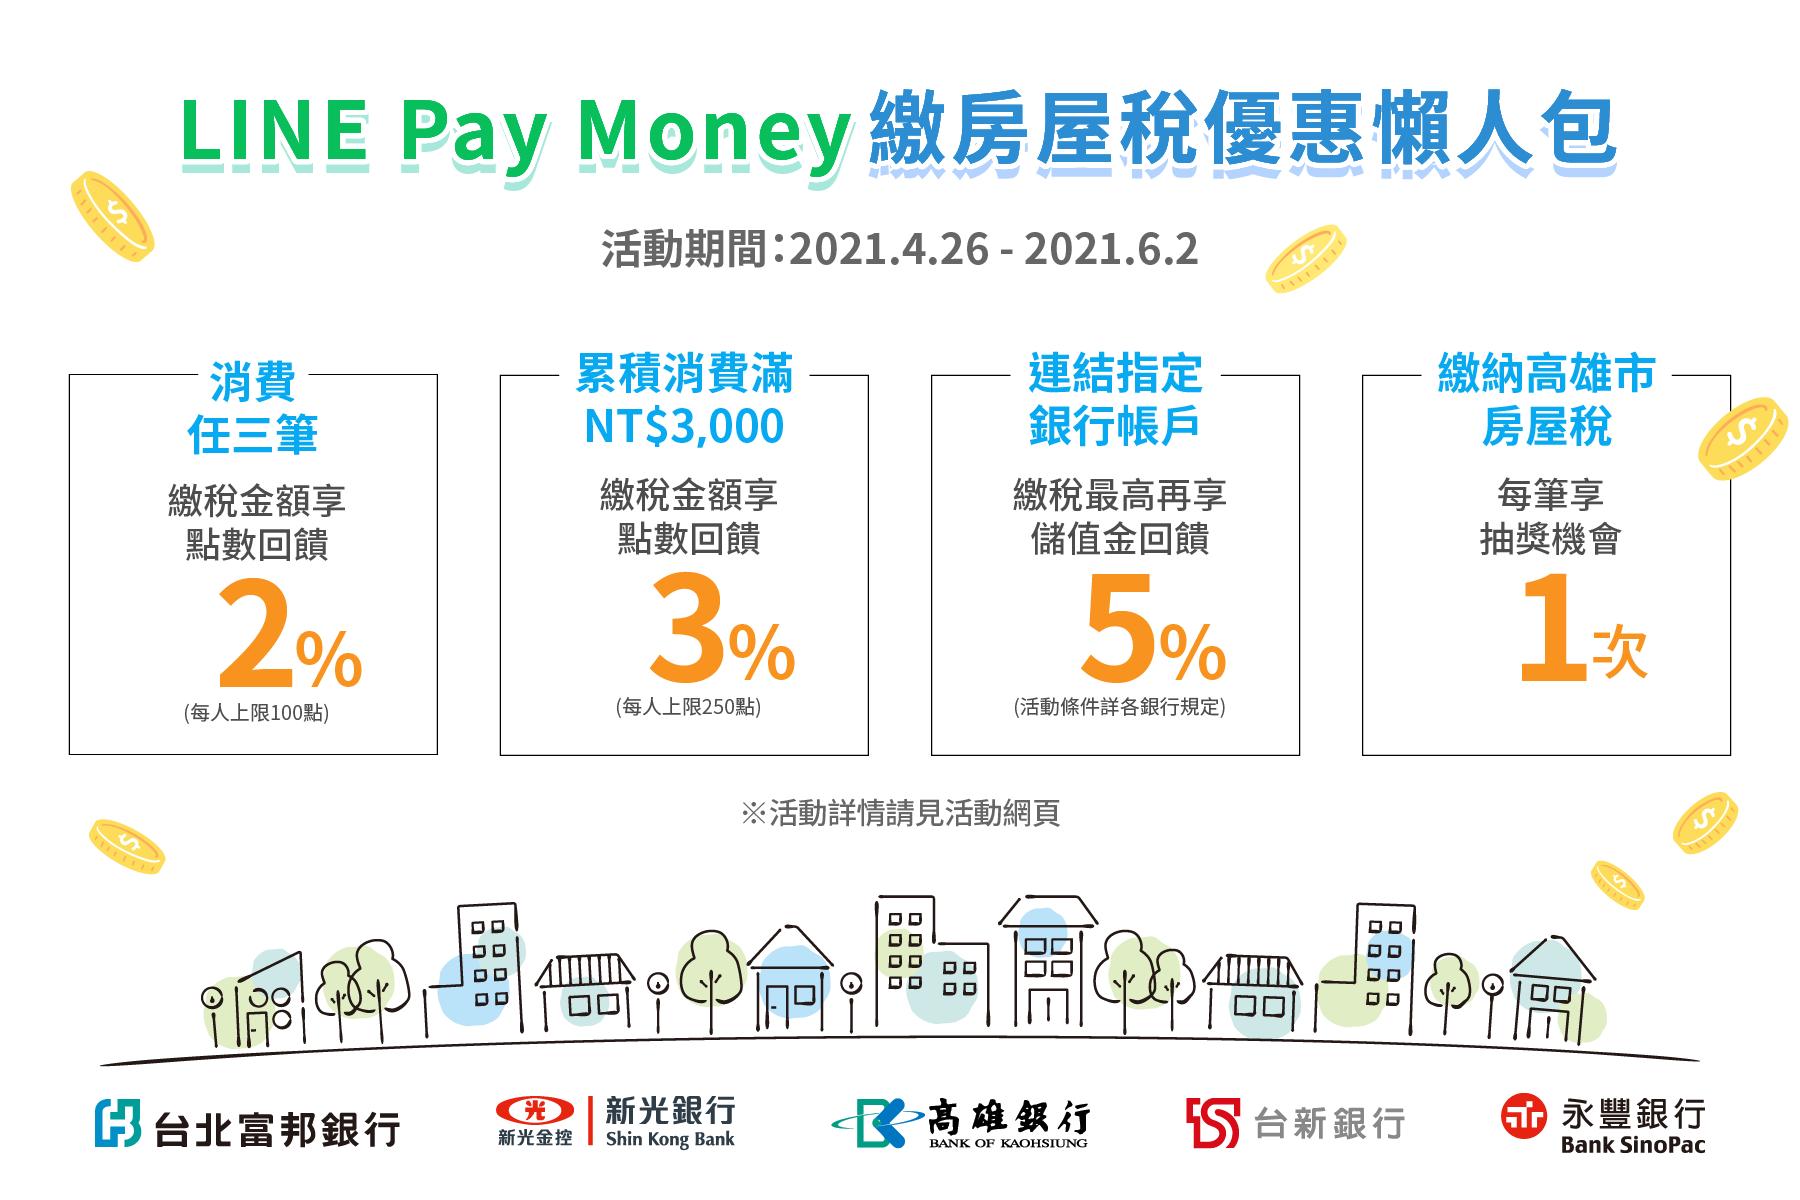 LINE Pay Money 繳房屋稅 2021 優惠懶人包